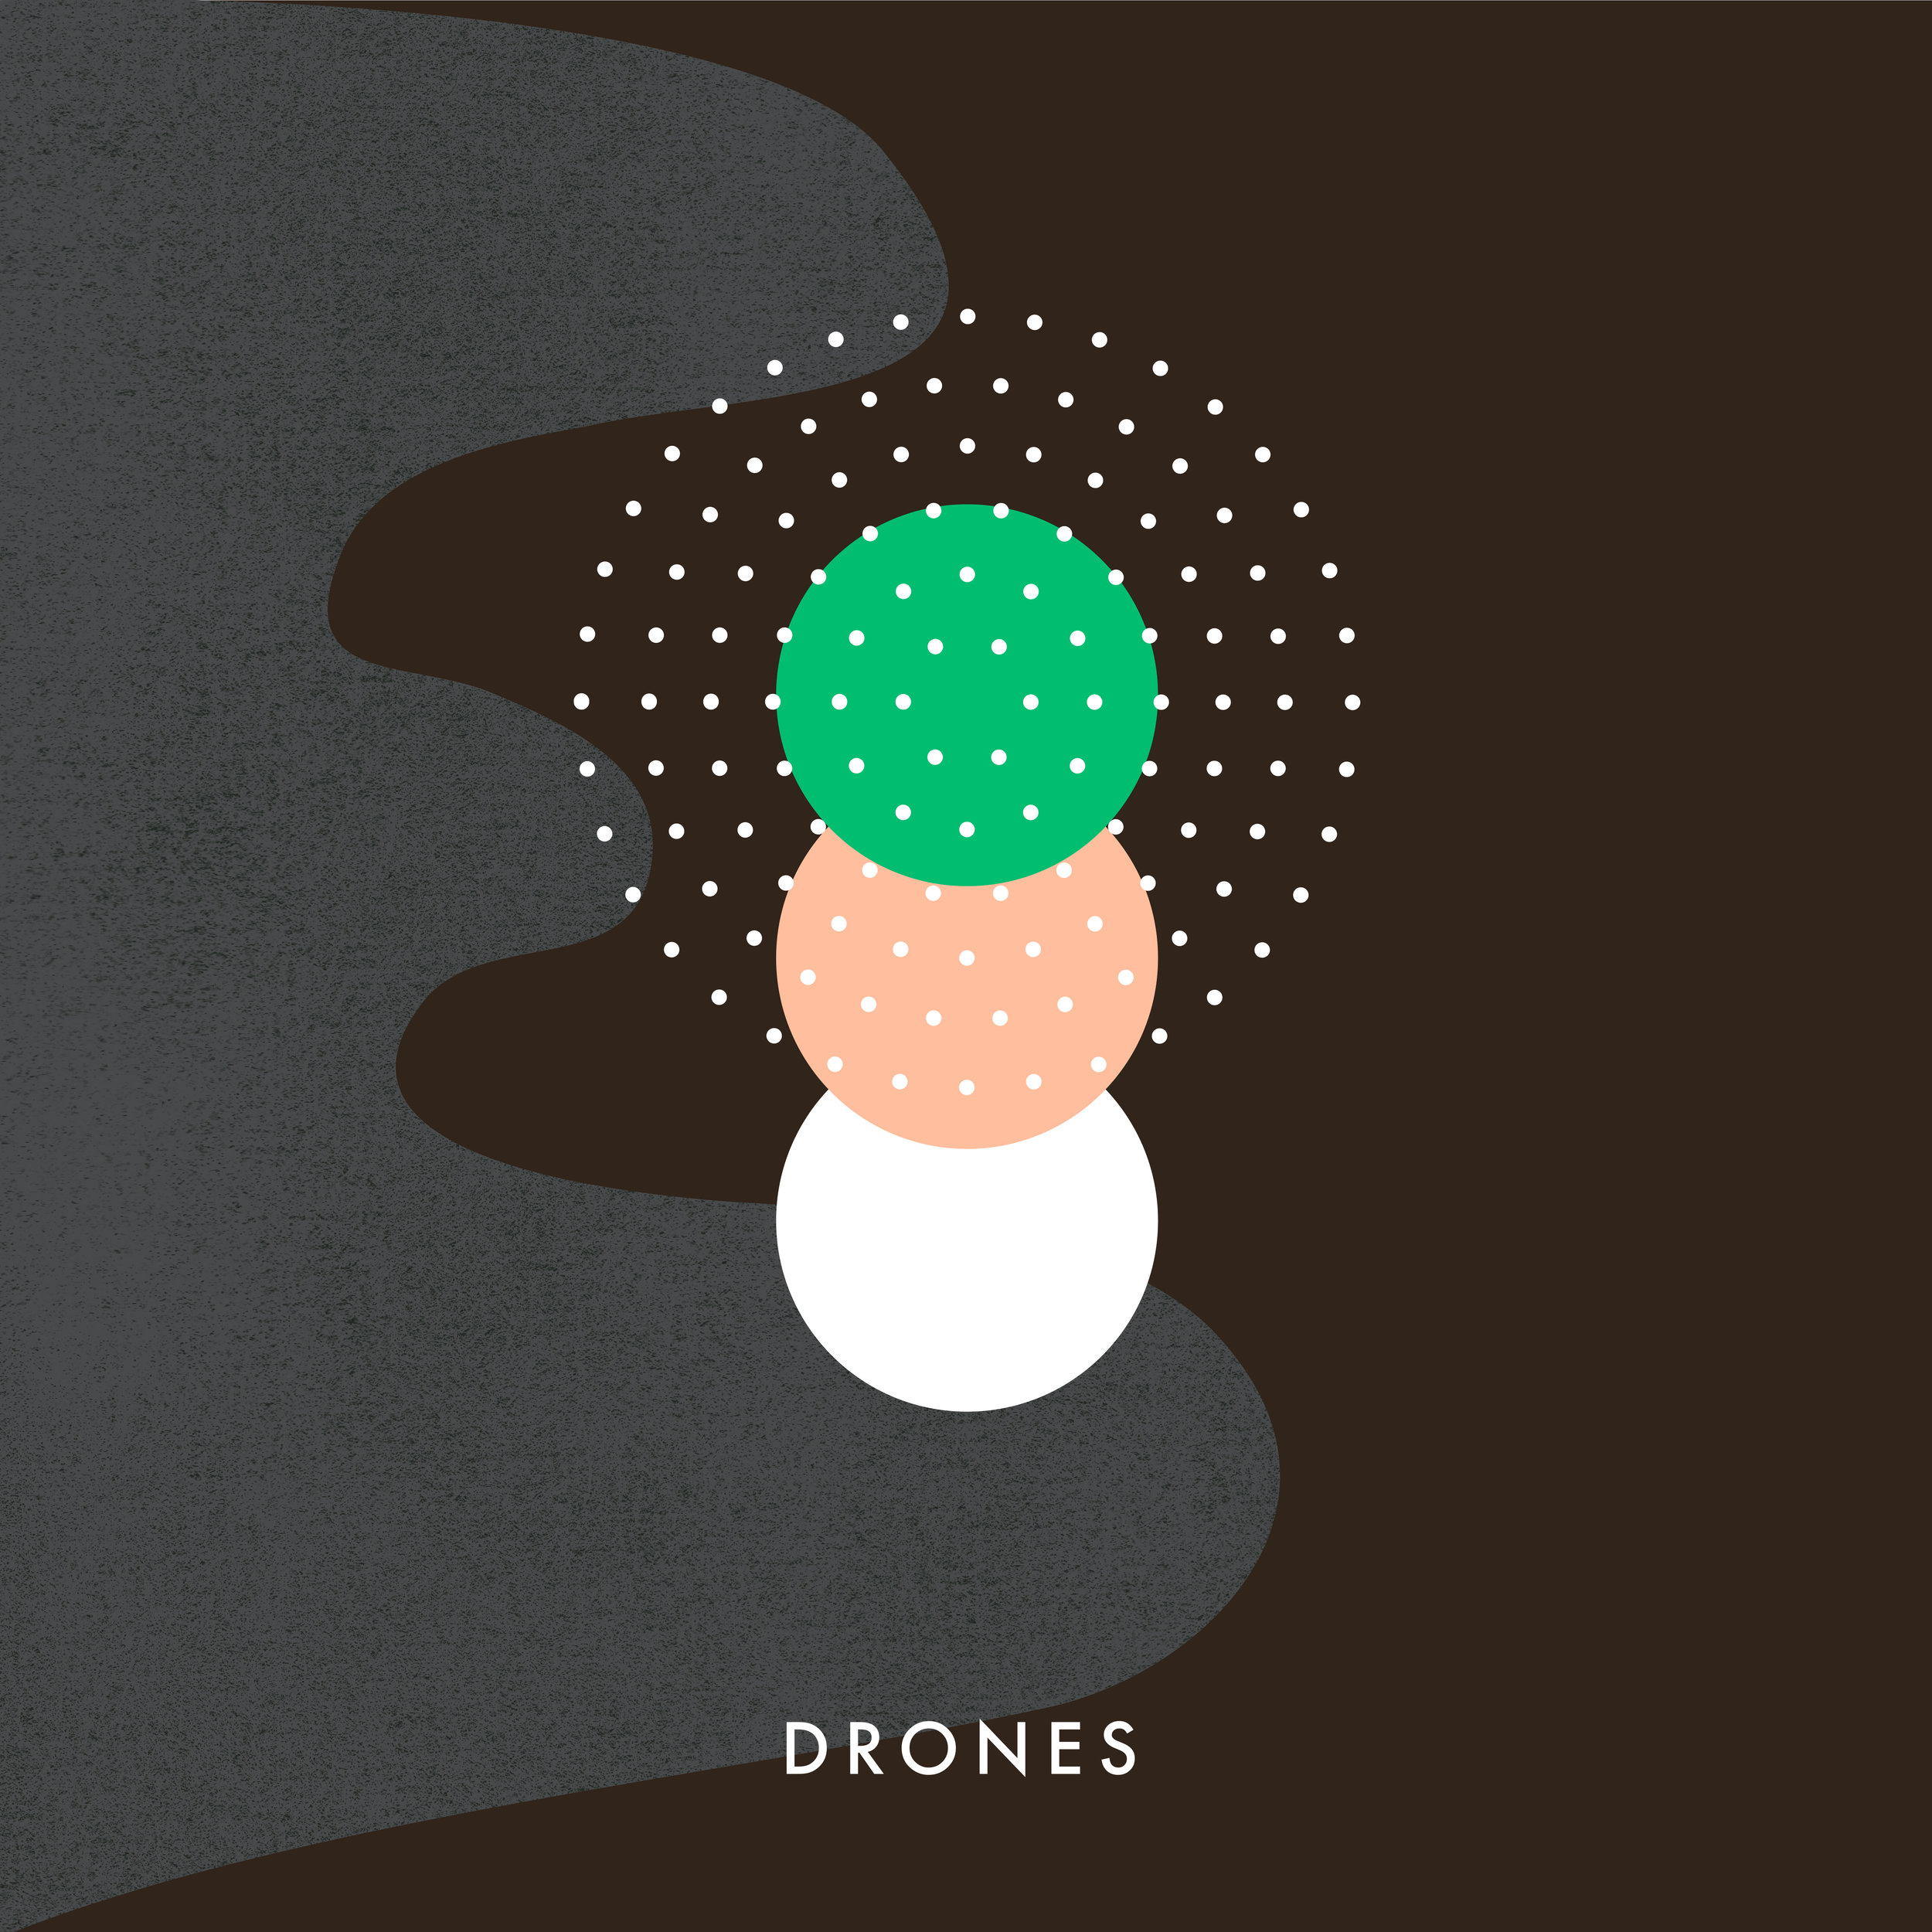 TOMRAY_DRONES_FINAL.jpg